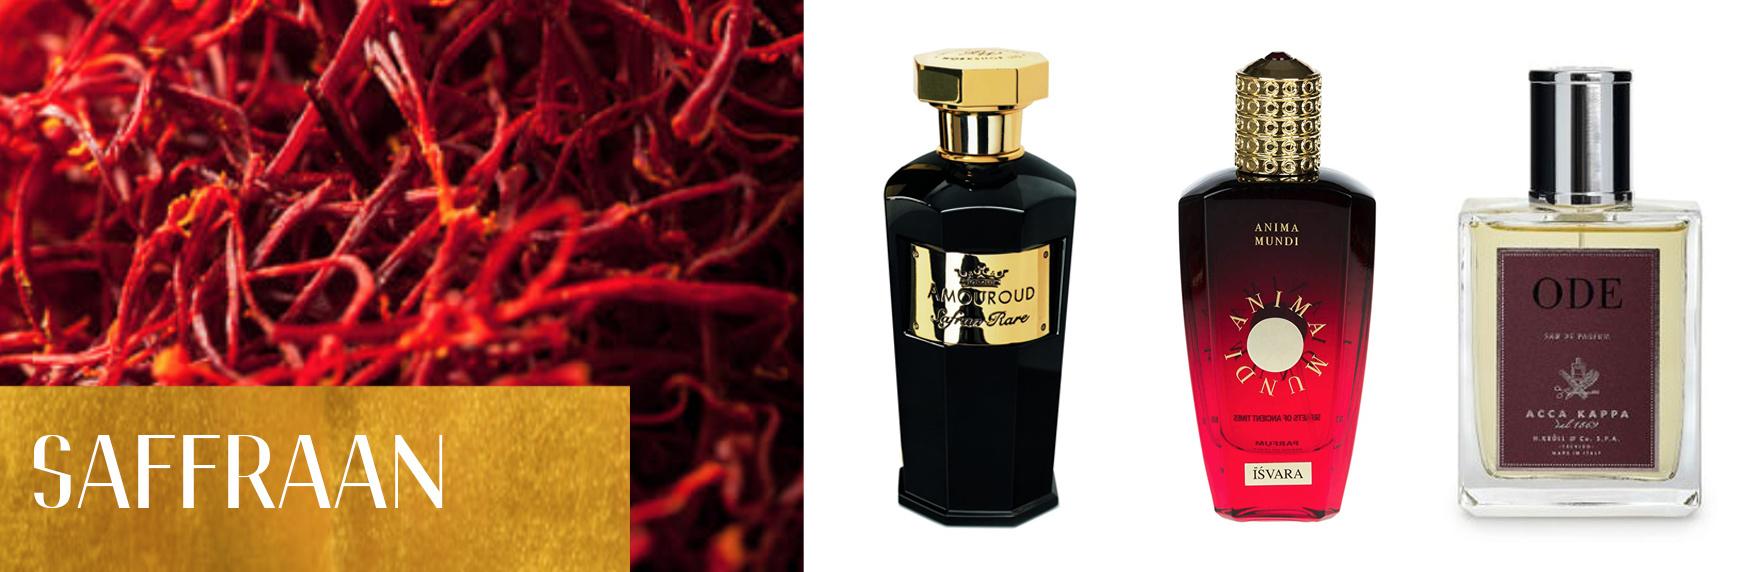 Perfume Ingredients: Saffron